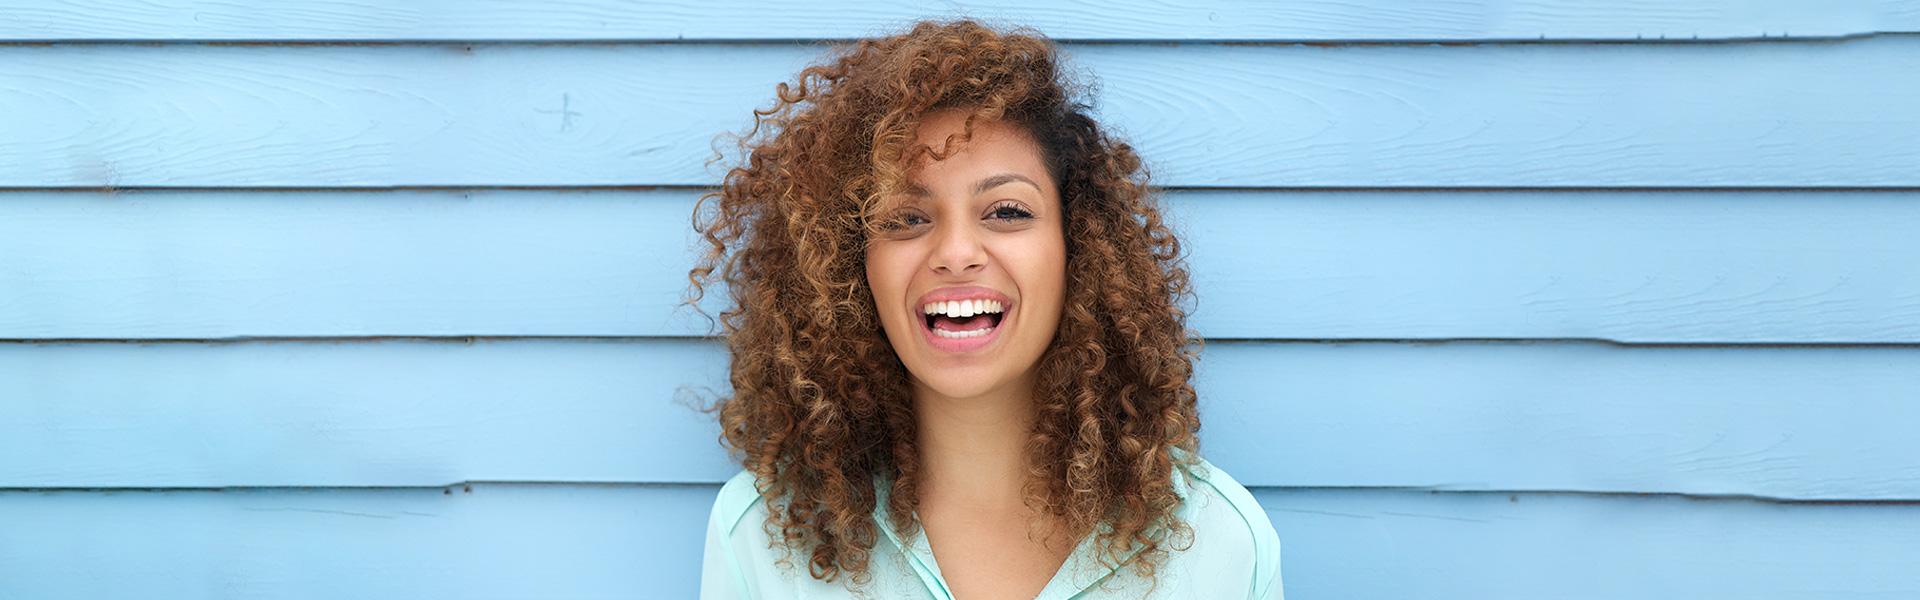 Tips for Excellent Dental Hygiene for Healthy Smiles